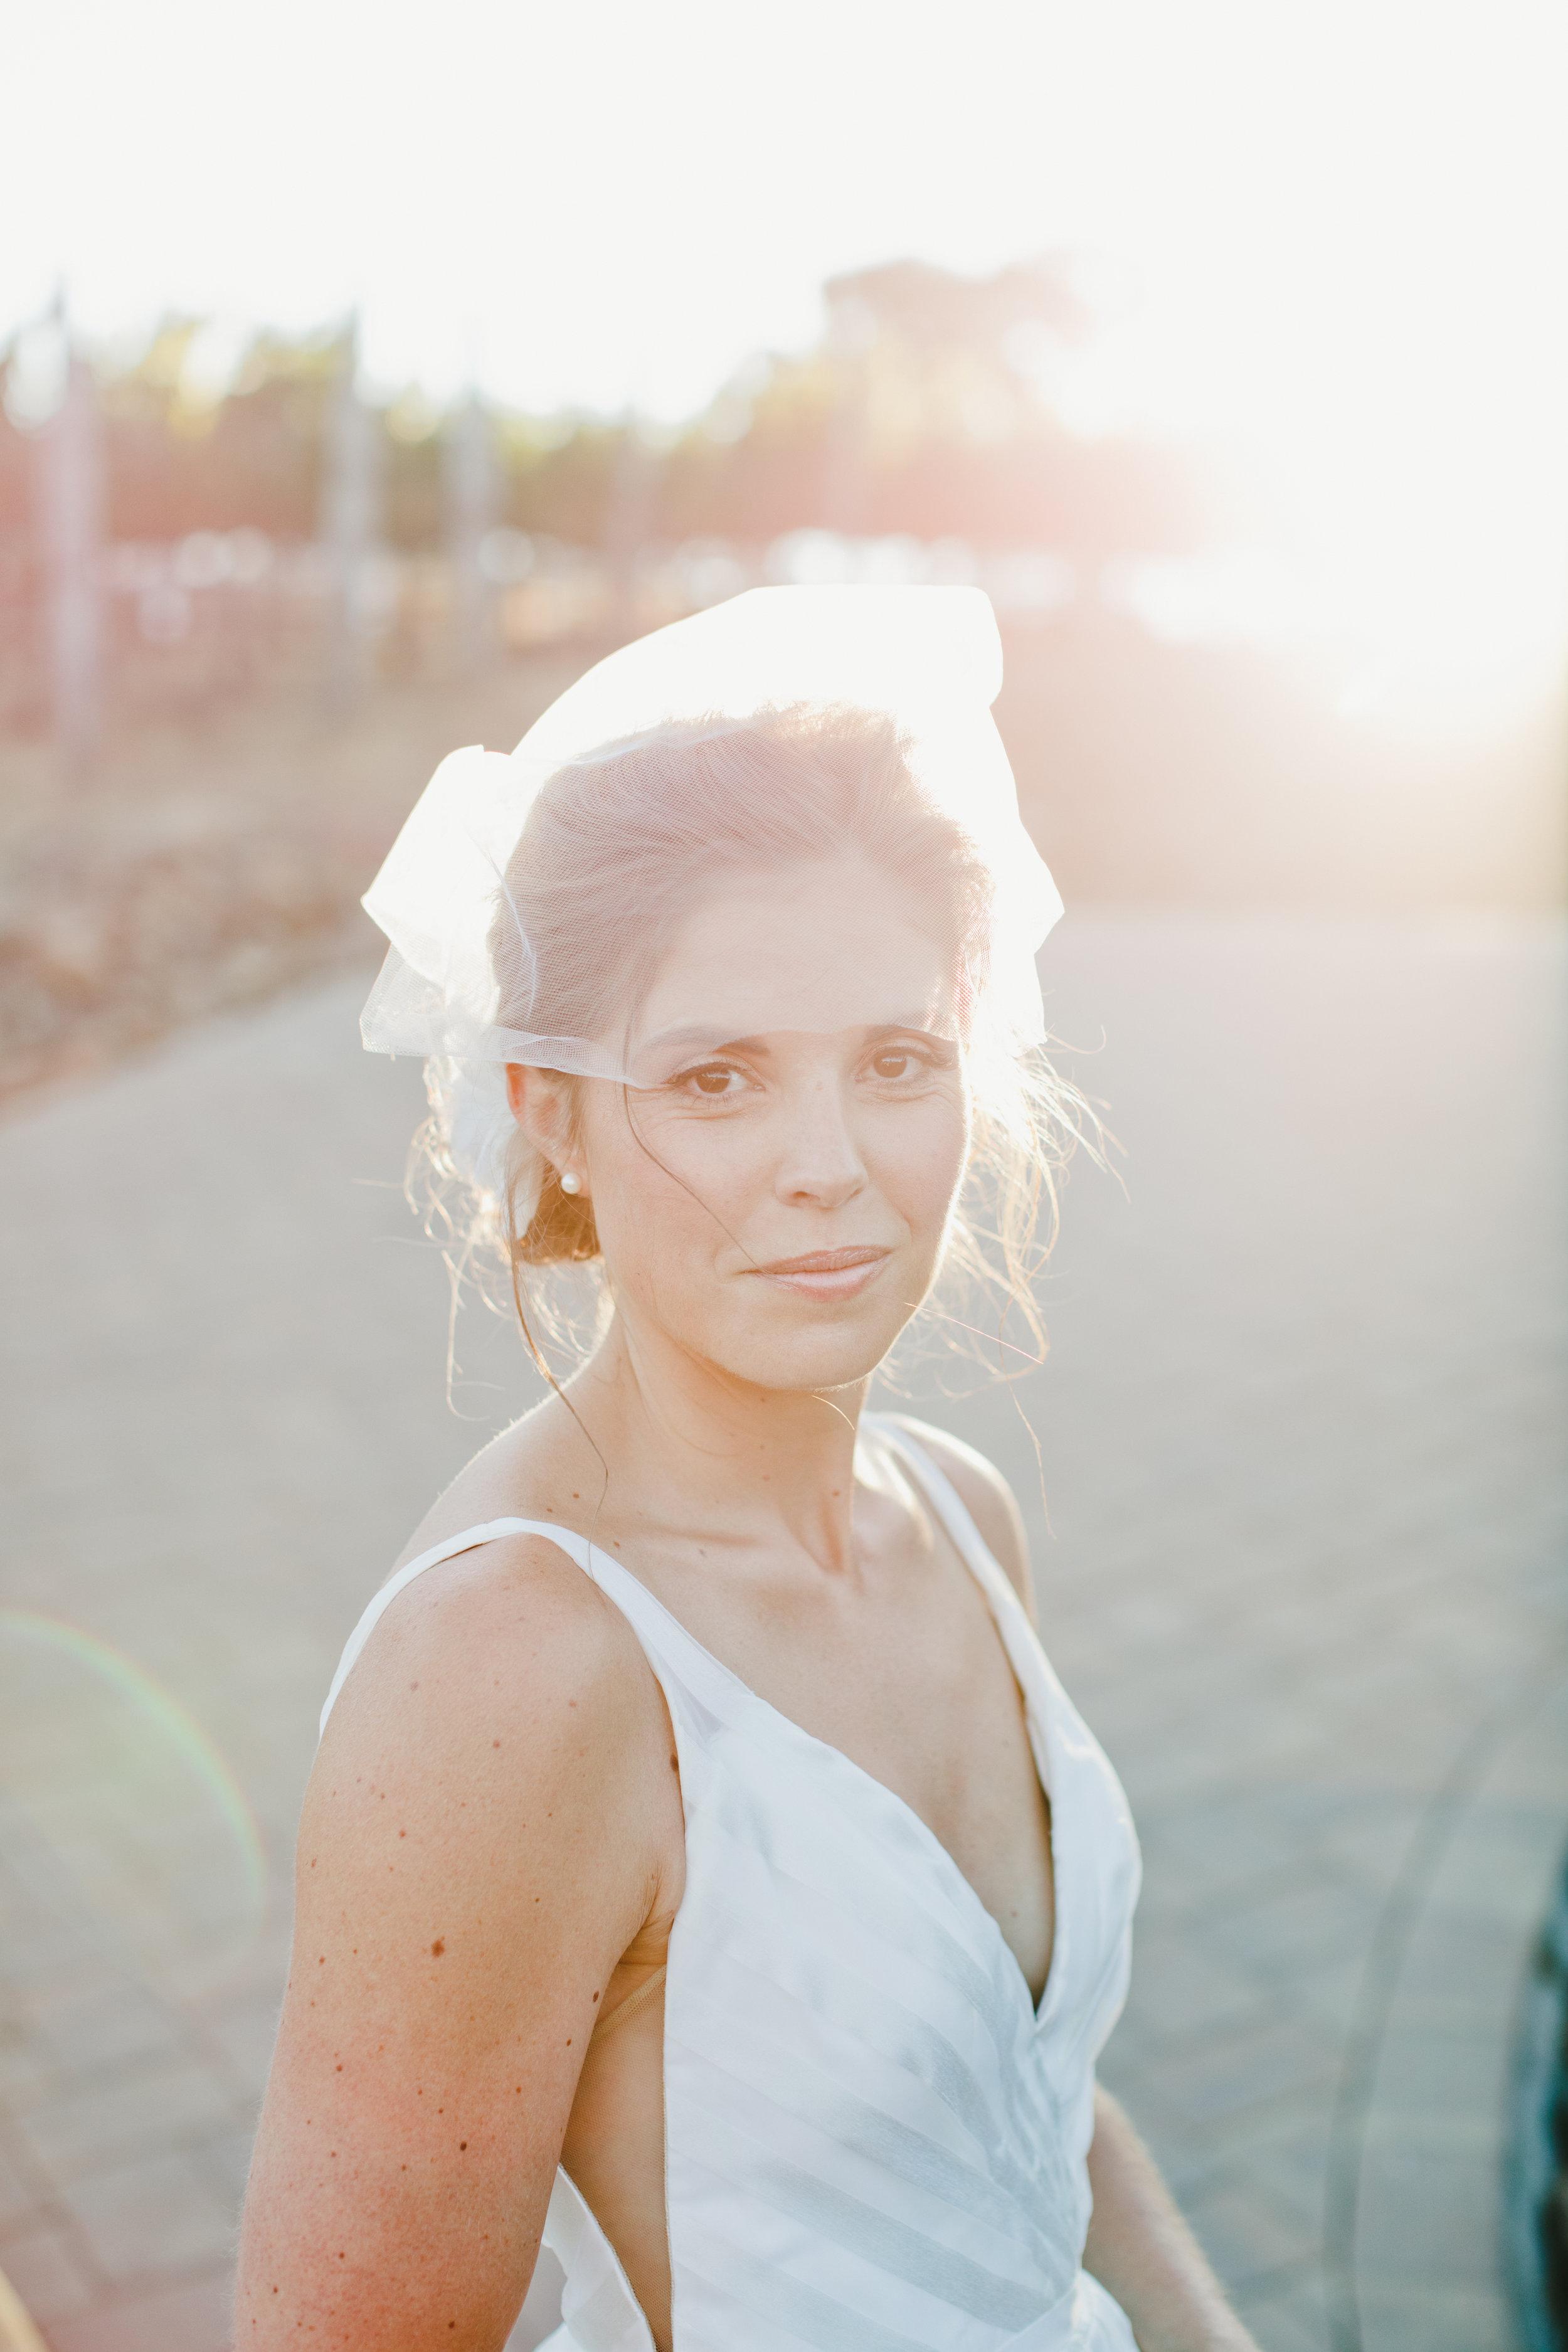 napa-makeup-and-hair-sonoma-makeup-artist-marin-wedding-makeup-san-francisco-airbrush-makeup-2.JPG